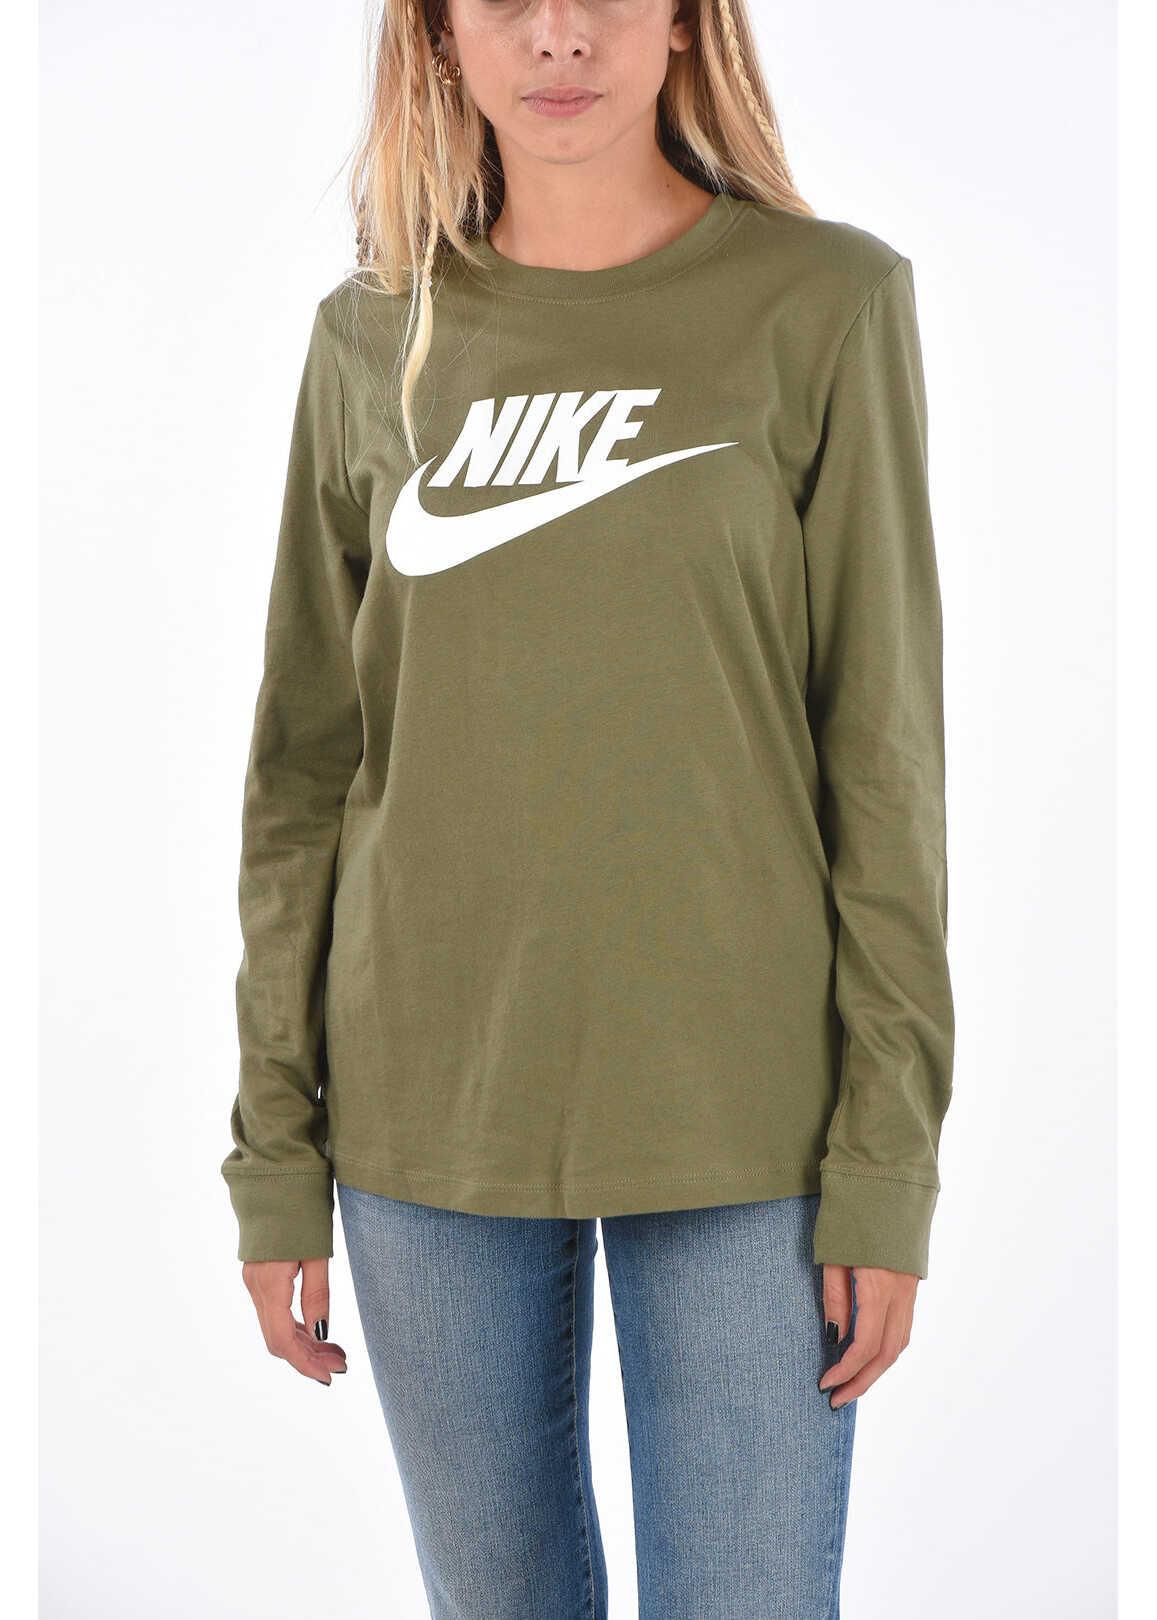 Nike Printed T-Shirt Military Green image0